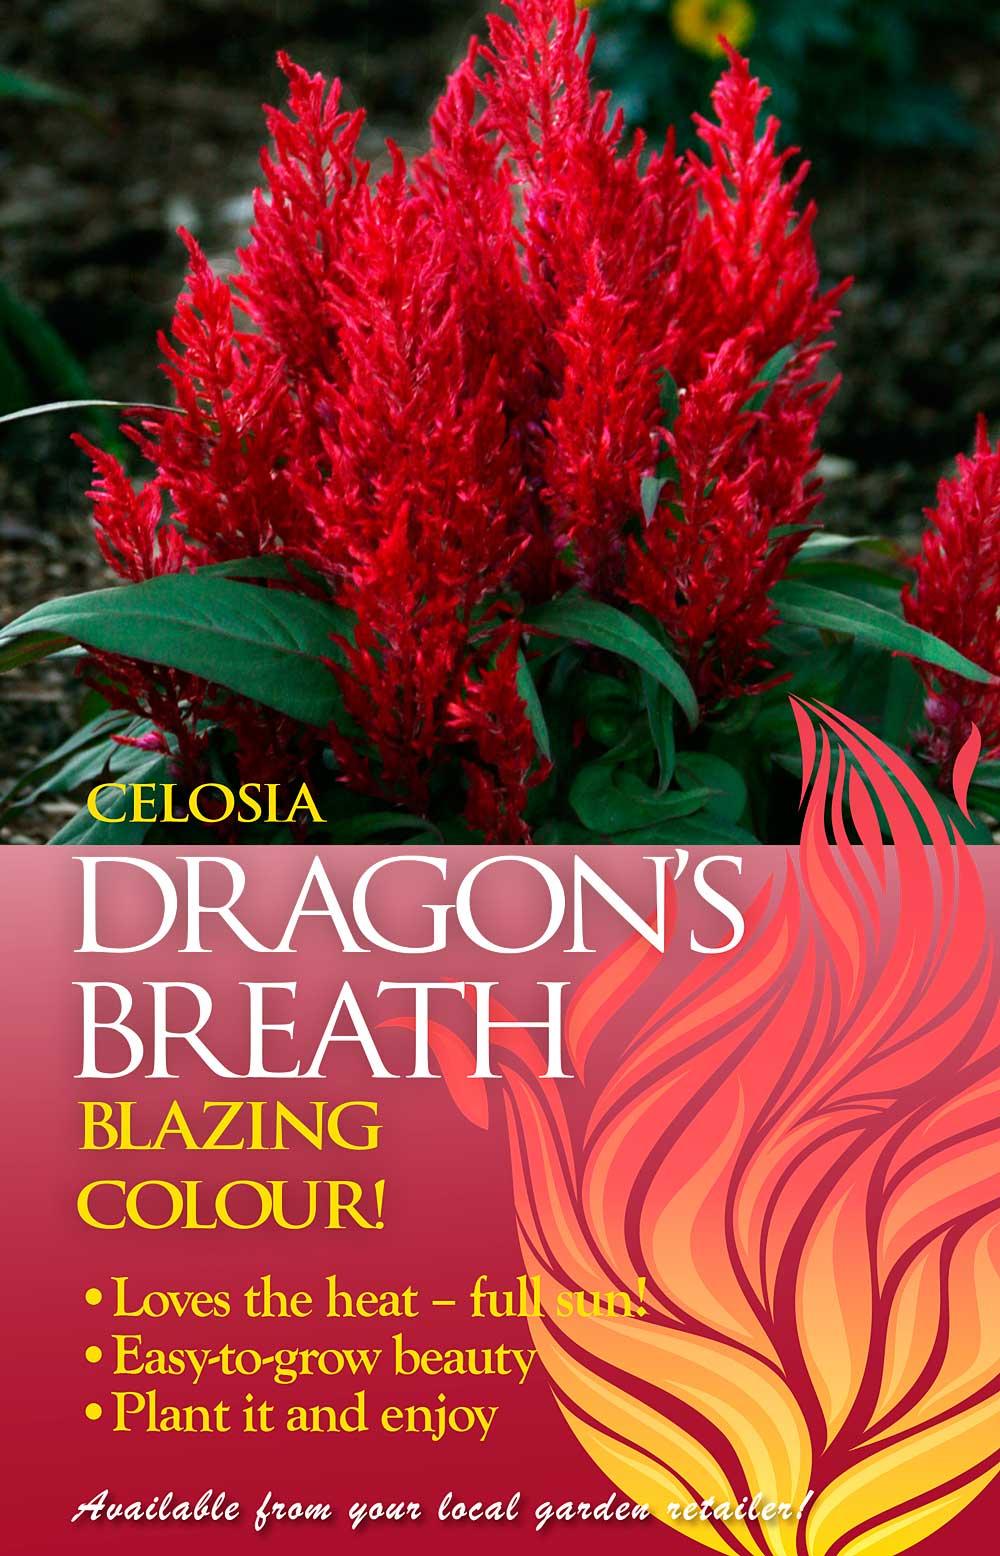 Celosia Dragons Breath Advert